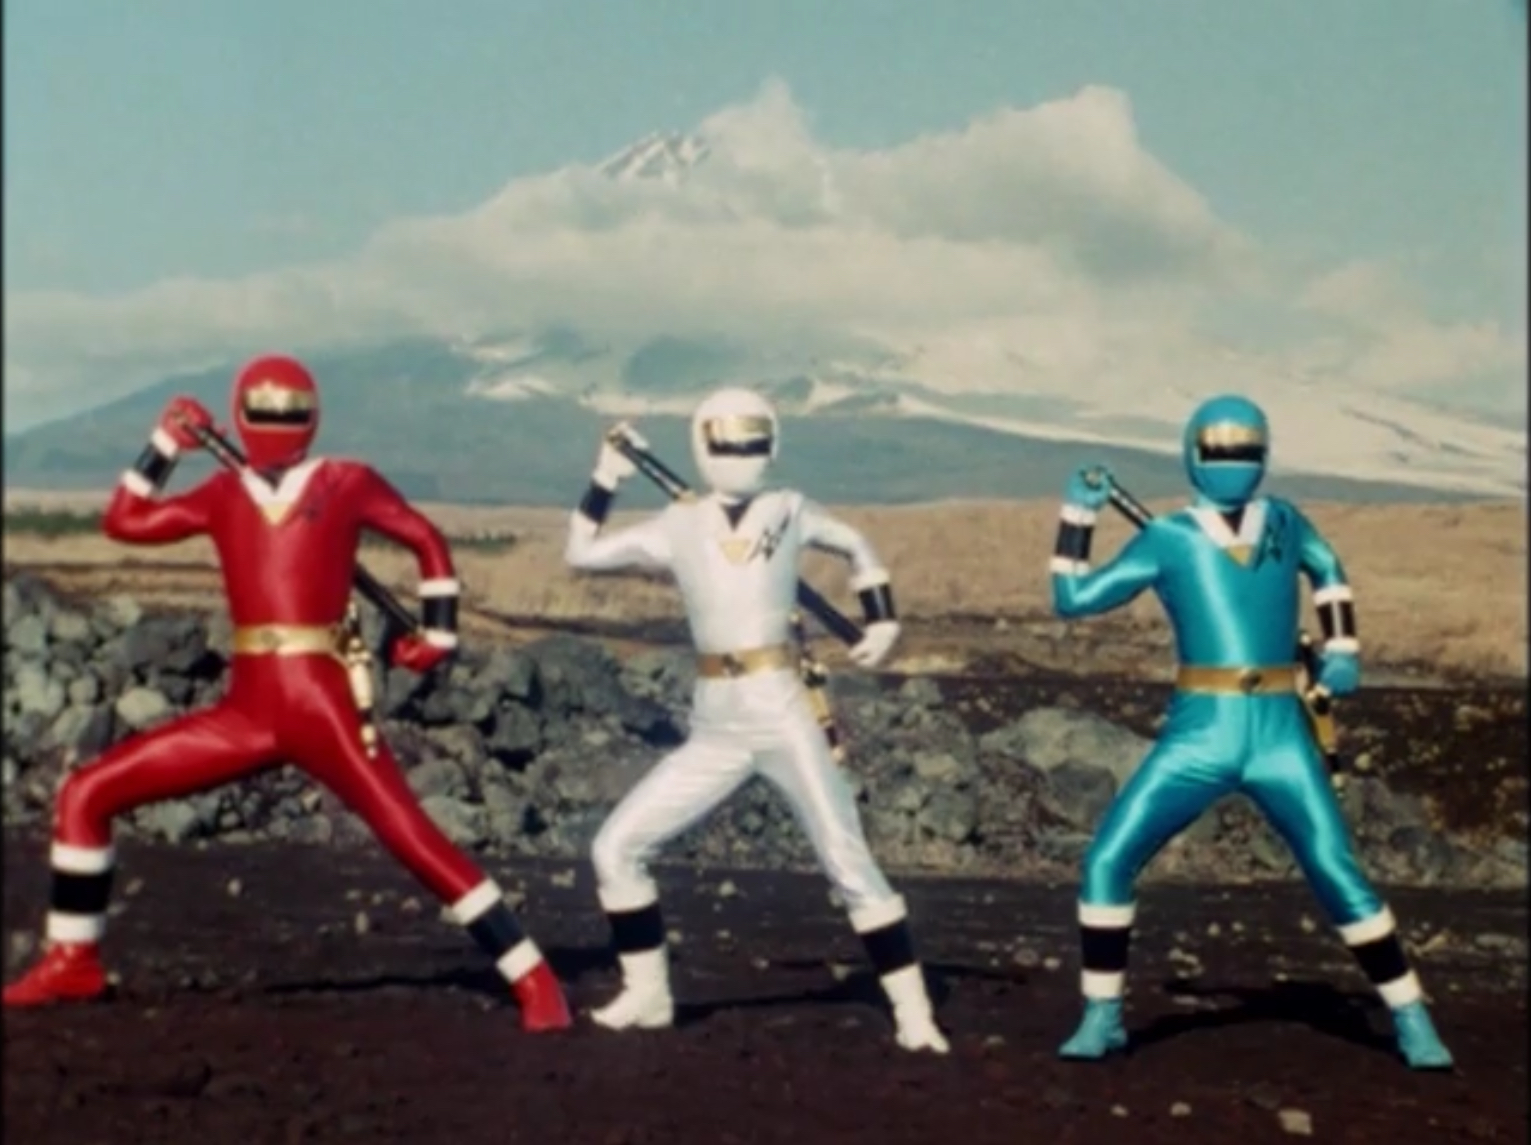 Ep. 1: We Are Ninja